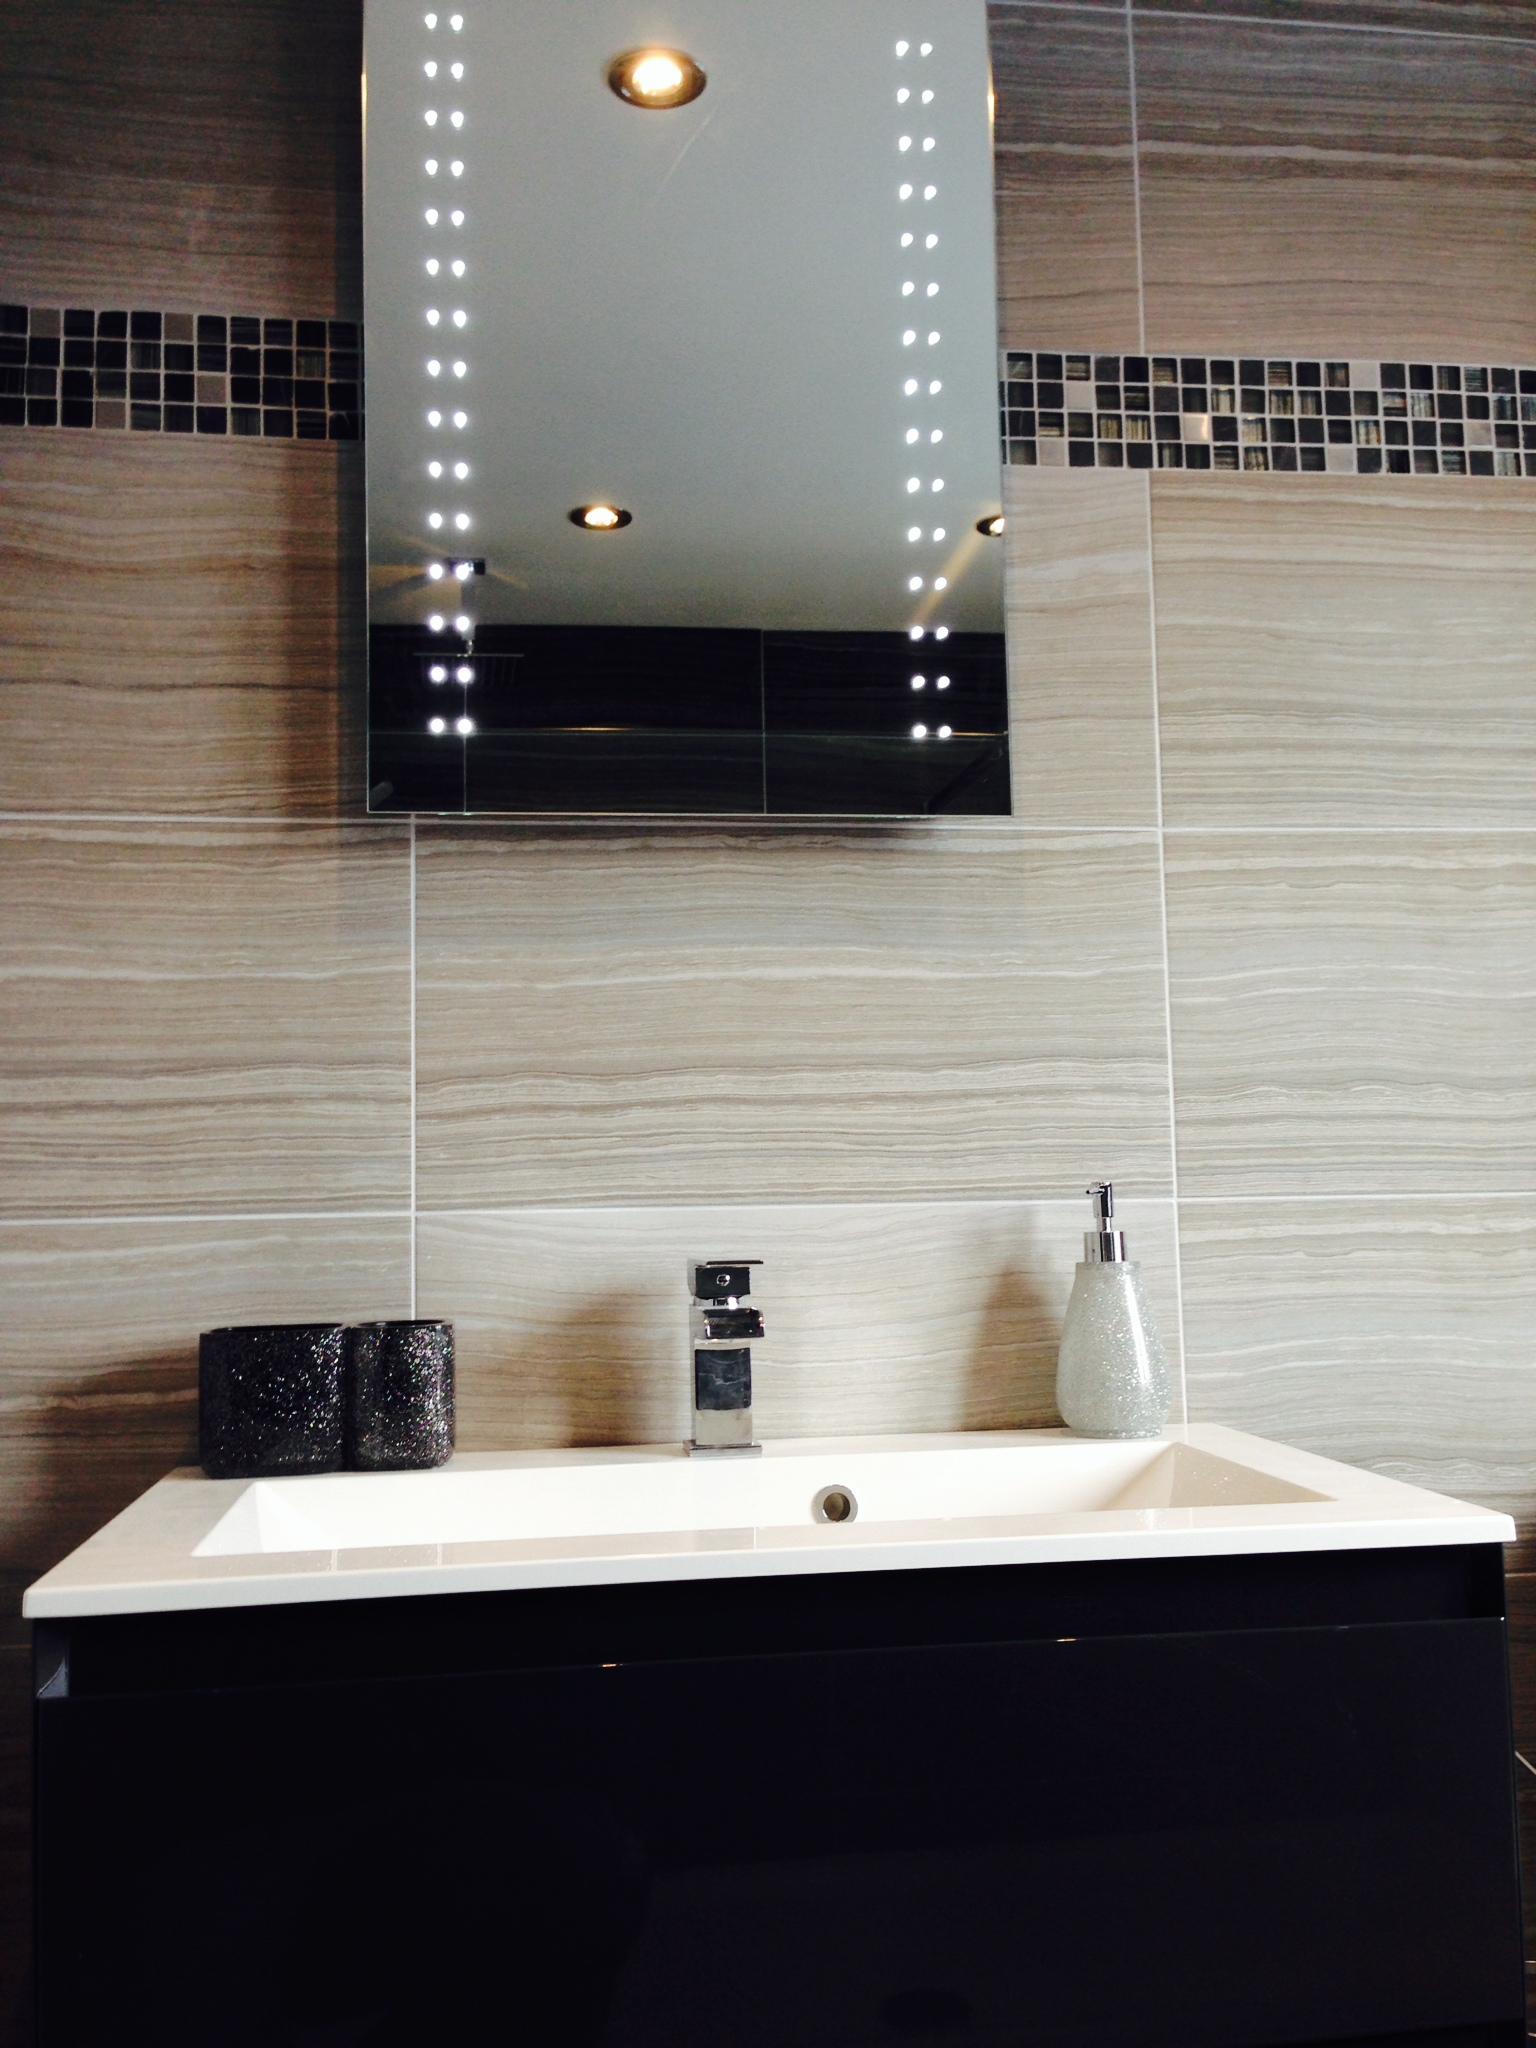 Ne Heating Plumbing Spares Bathroom Showrooms In Bishop Auckland Click2find The Northern